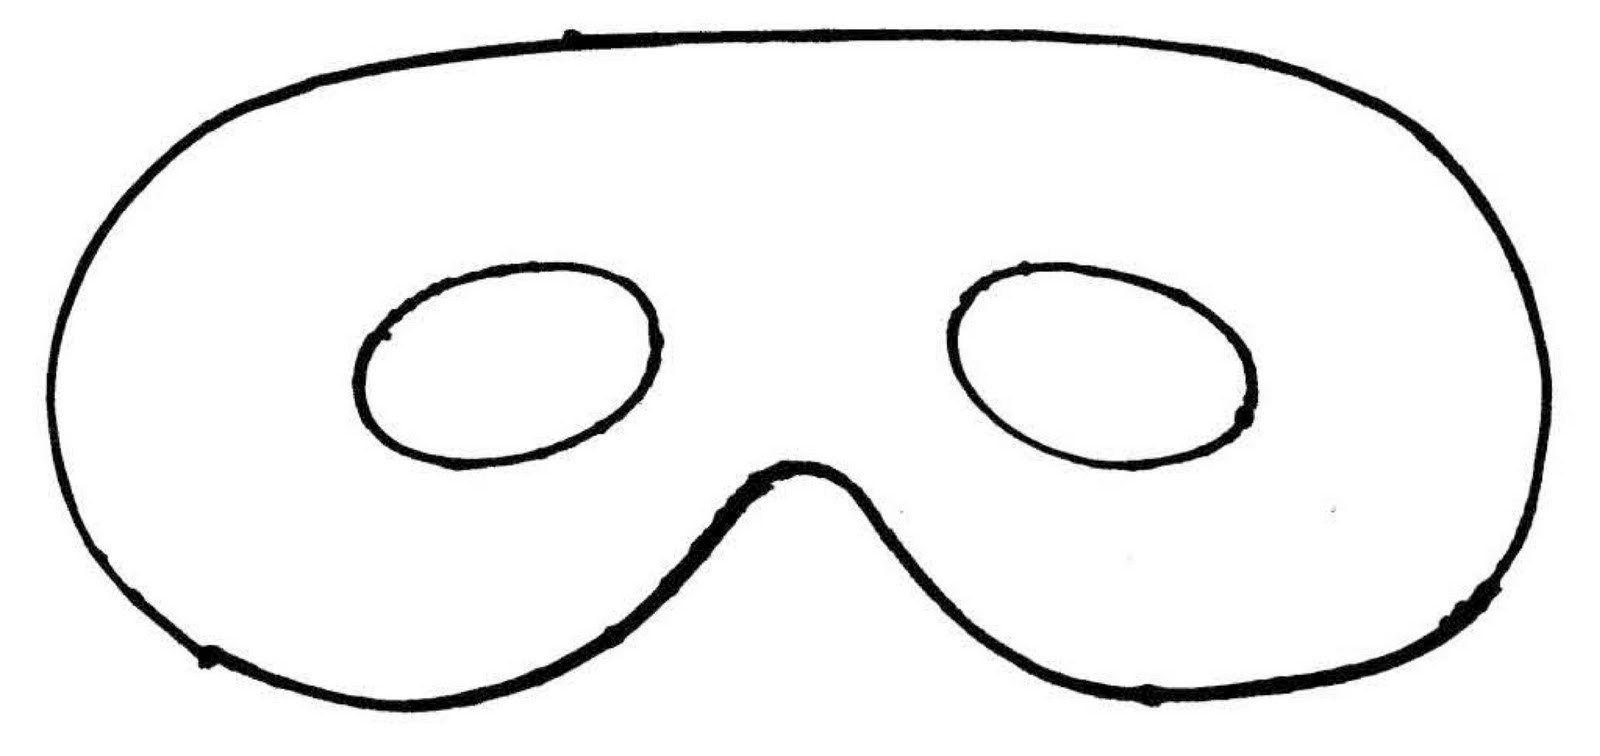 Mask Outline With Plain Mask Template Printa Ble Heart Shape